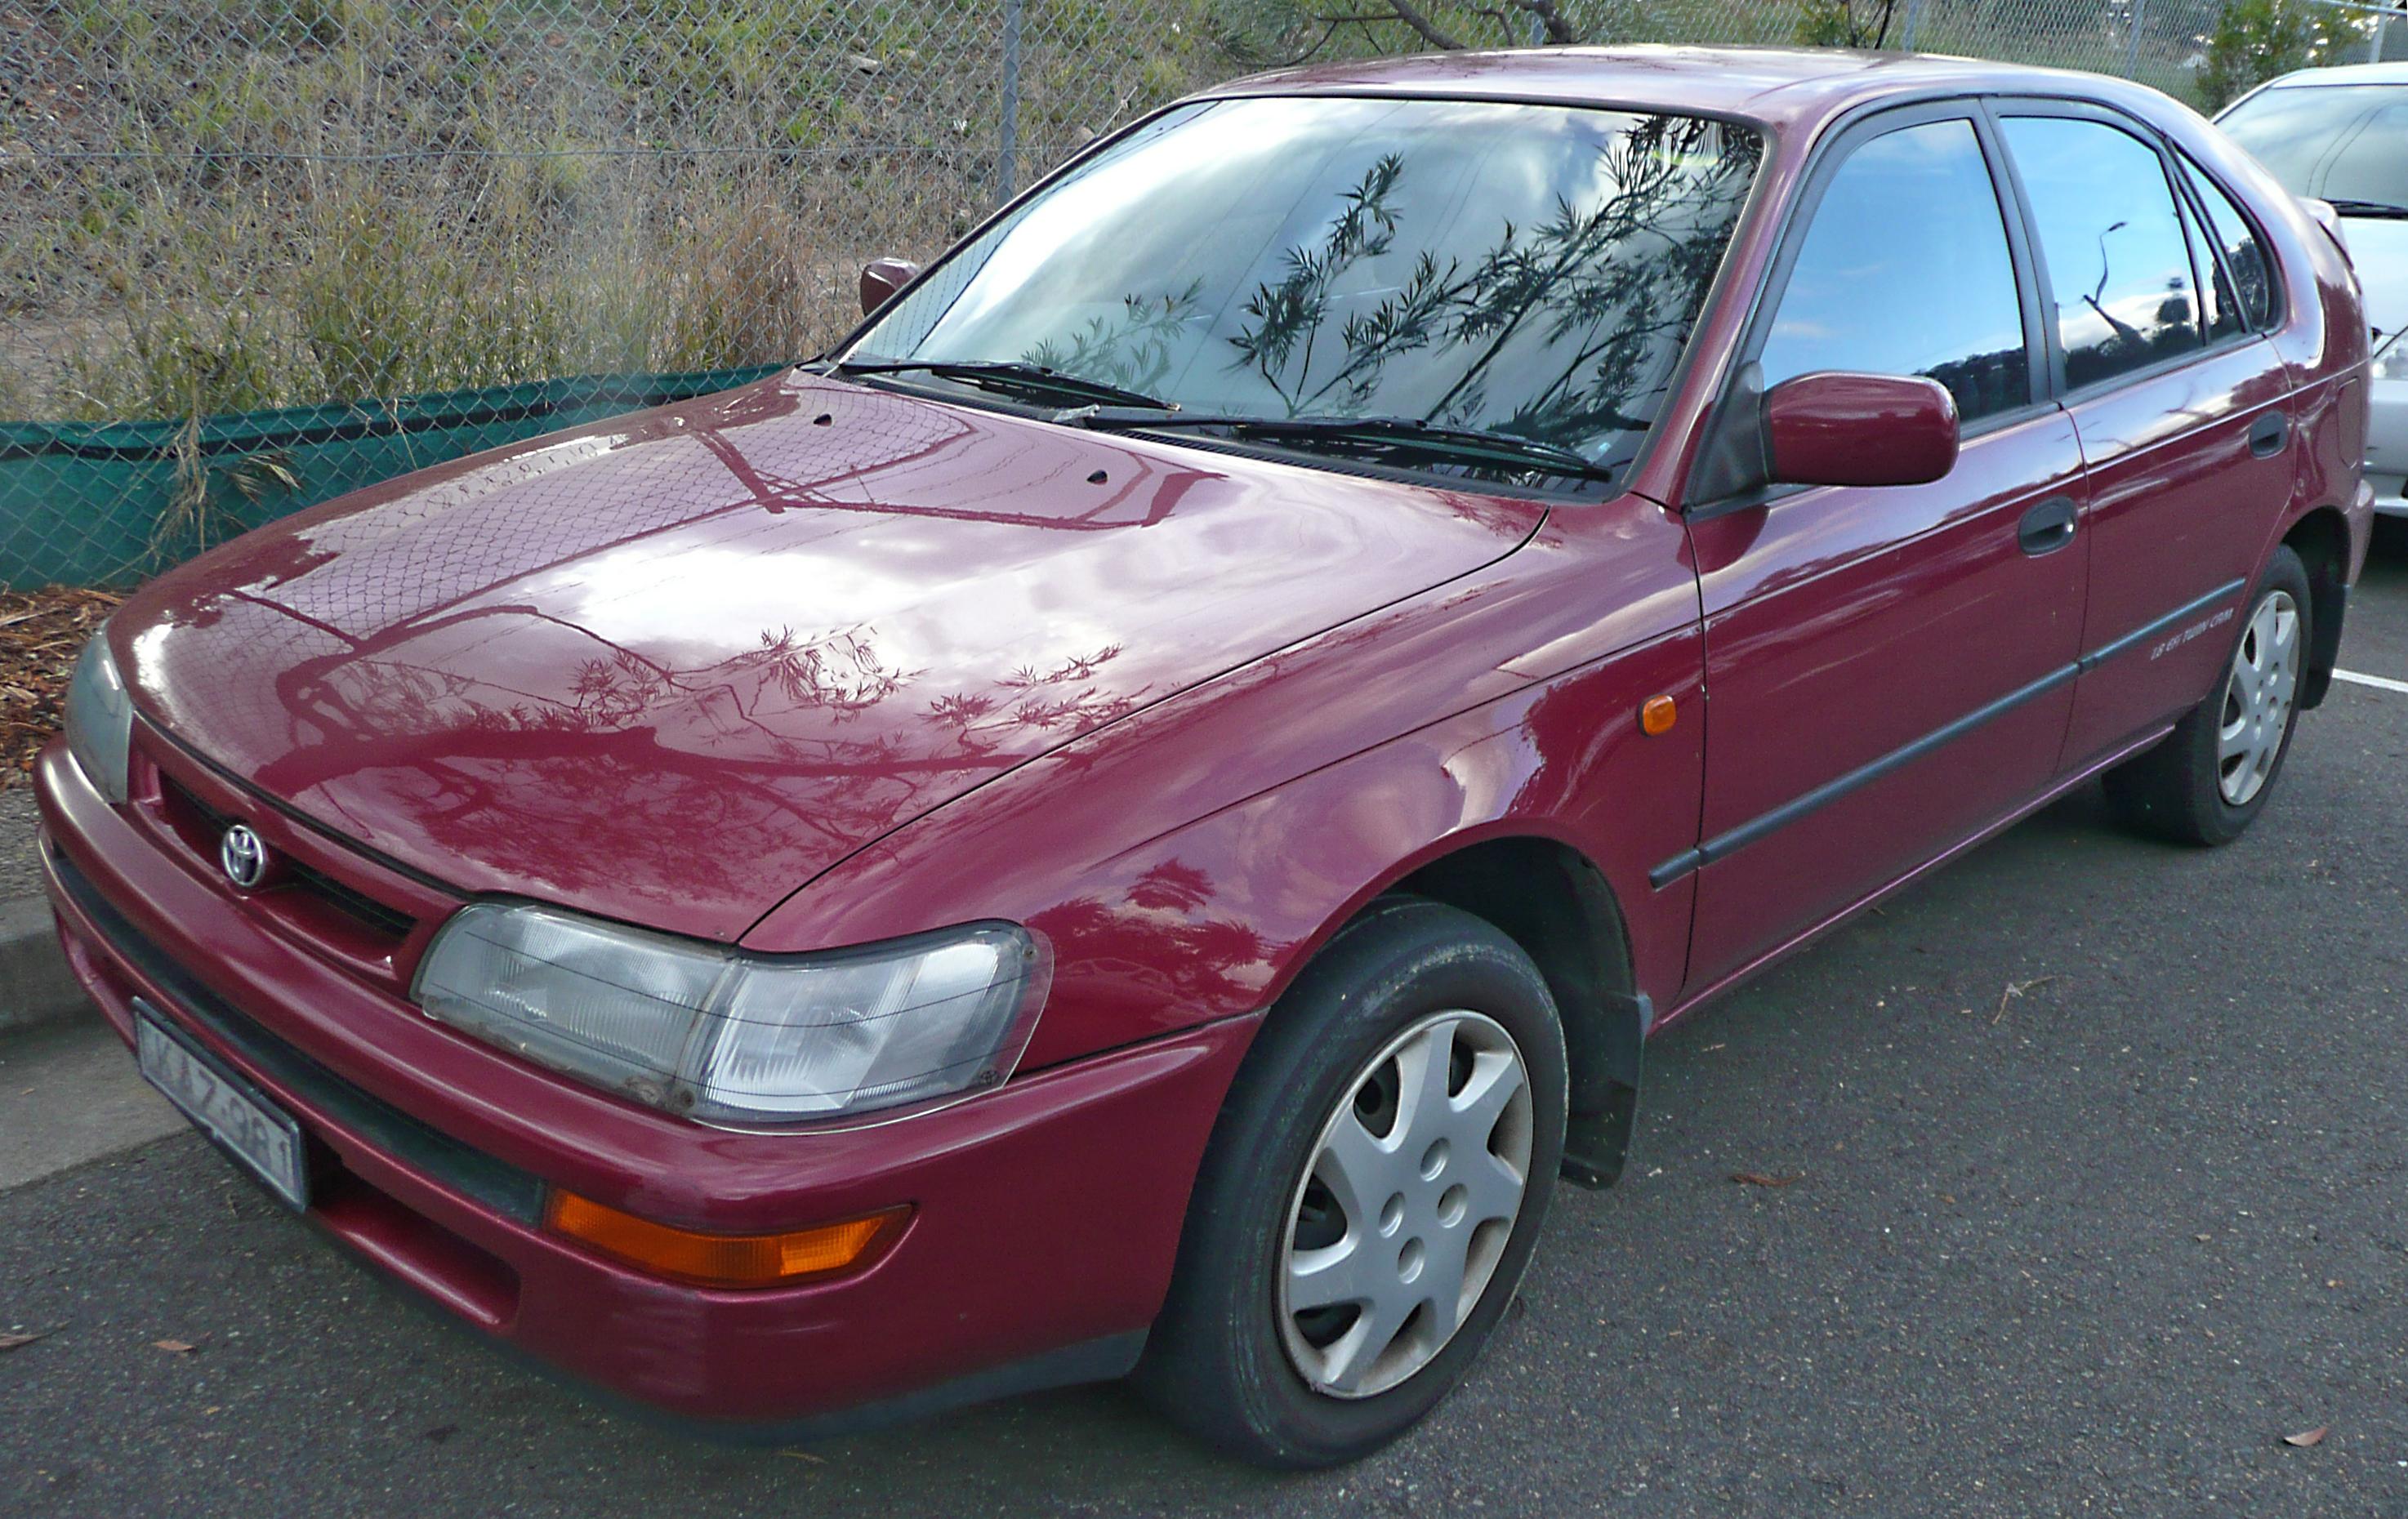 File19961998 Toyota Corolla AE102R RV Seca 5door hatchback 03